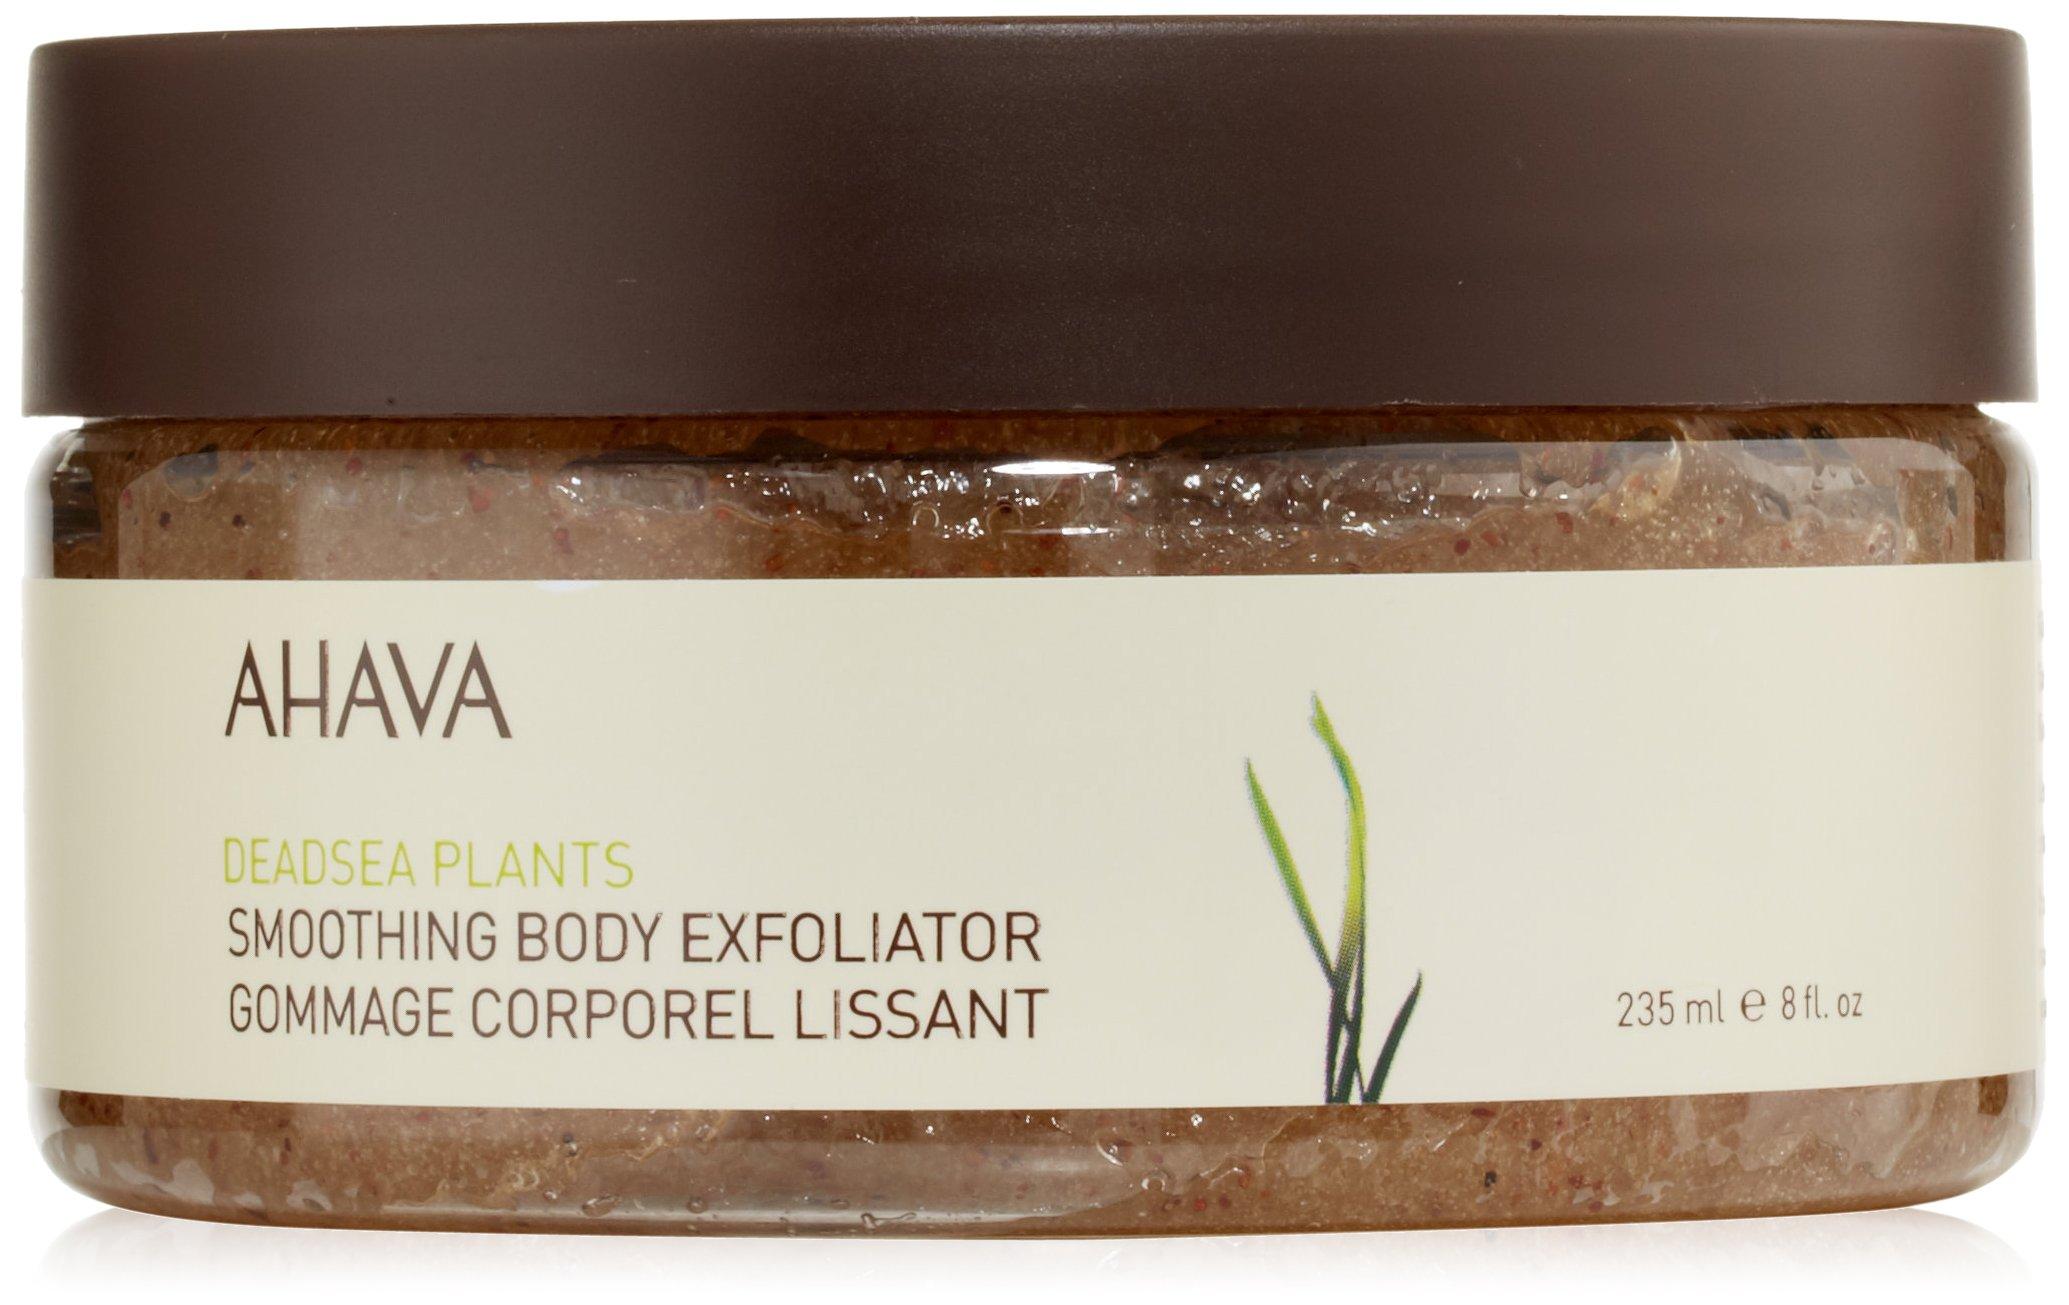 AHAVA Dead Sea Plants Smoothing Body Exfoliator, 8 fl. oz.